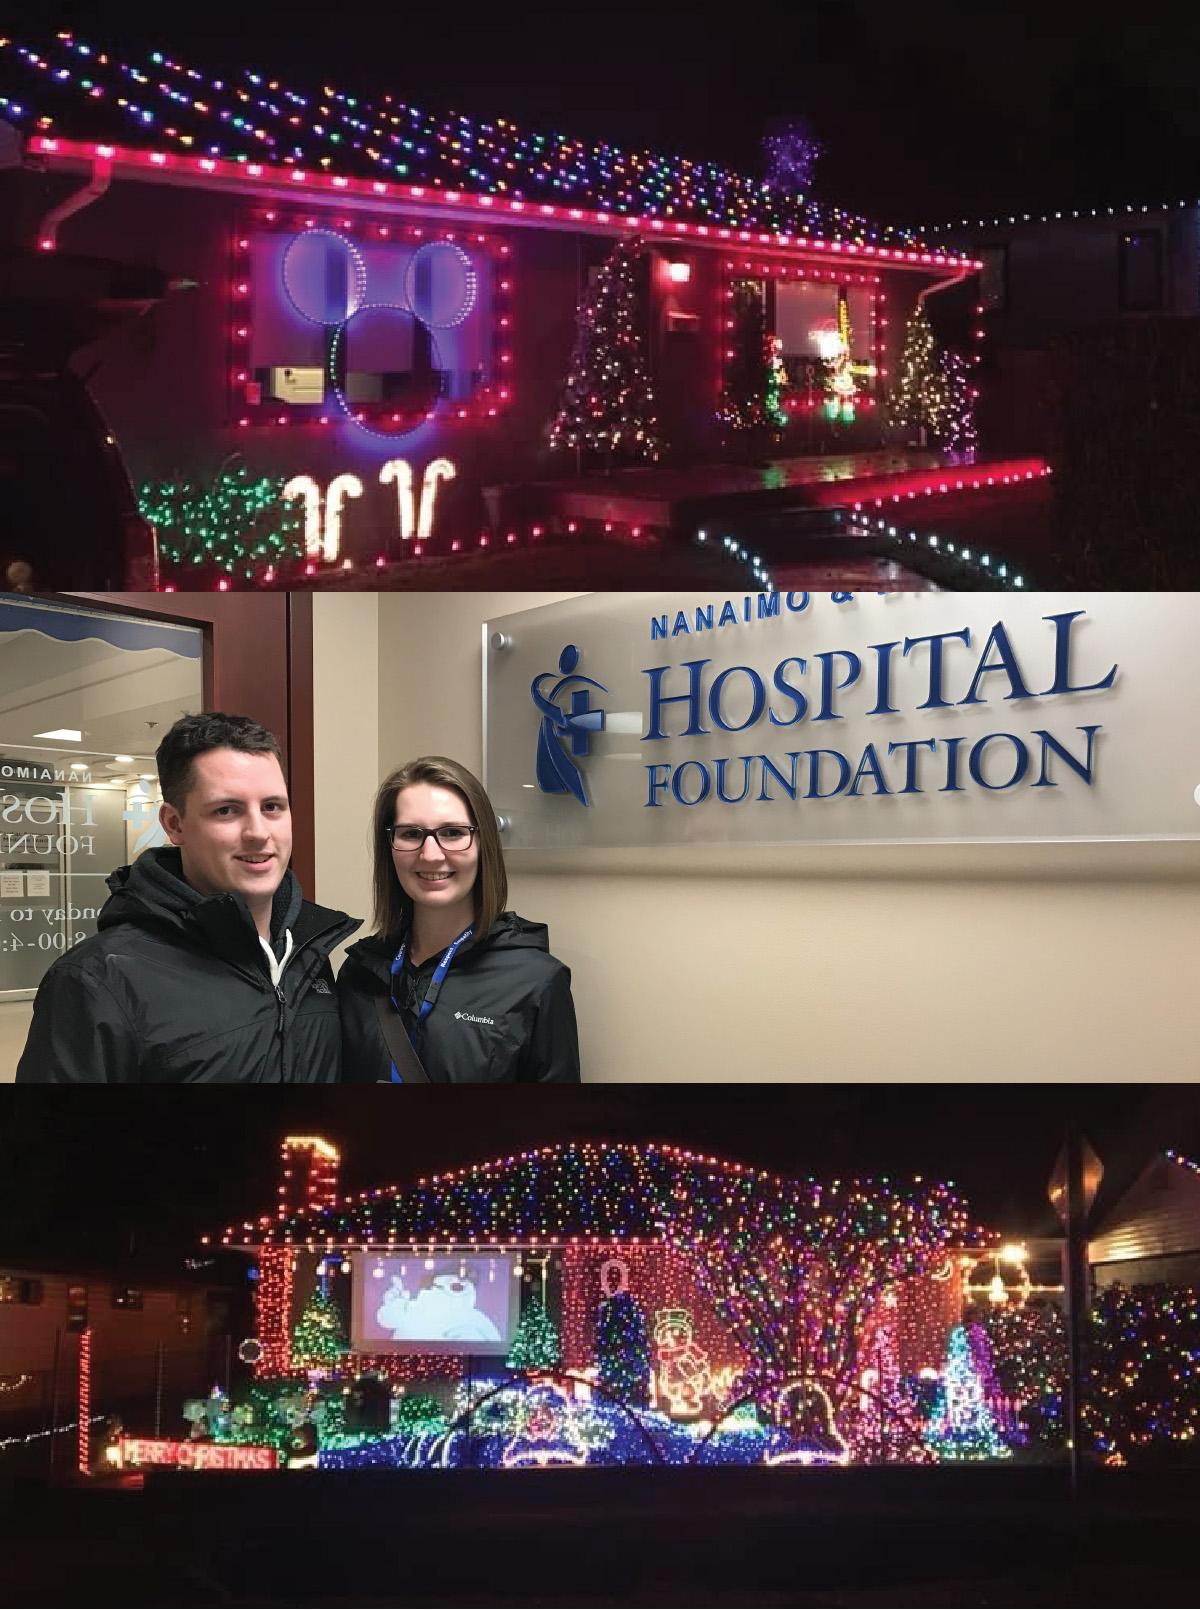 Christmas Display Brings in Donations